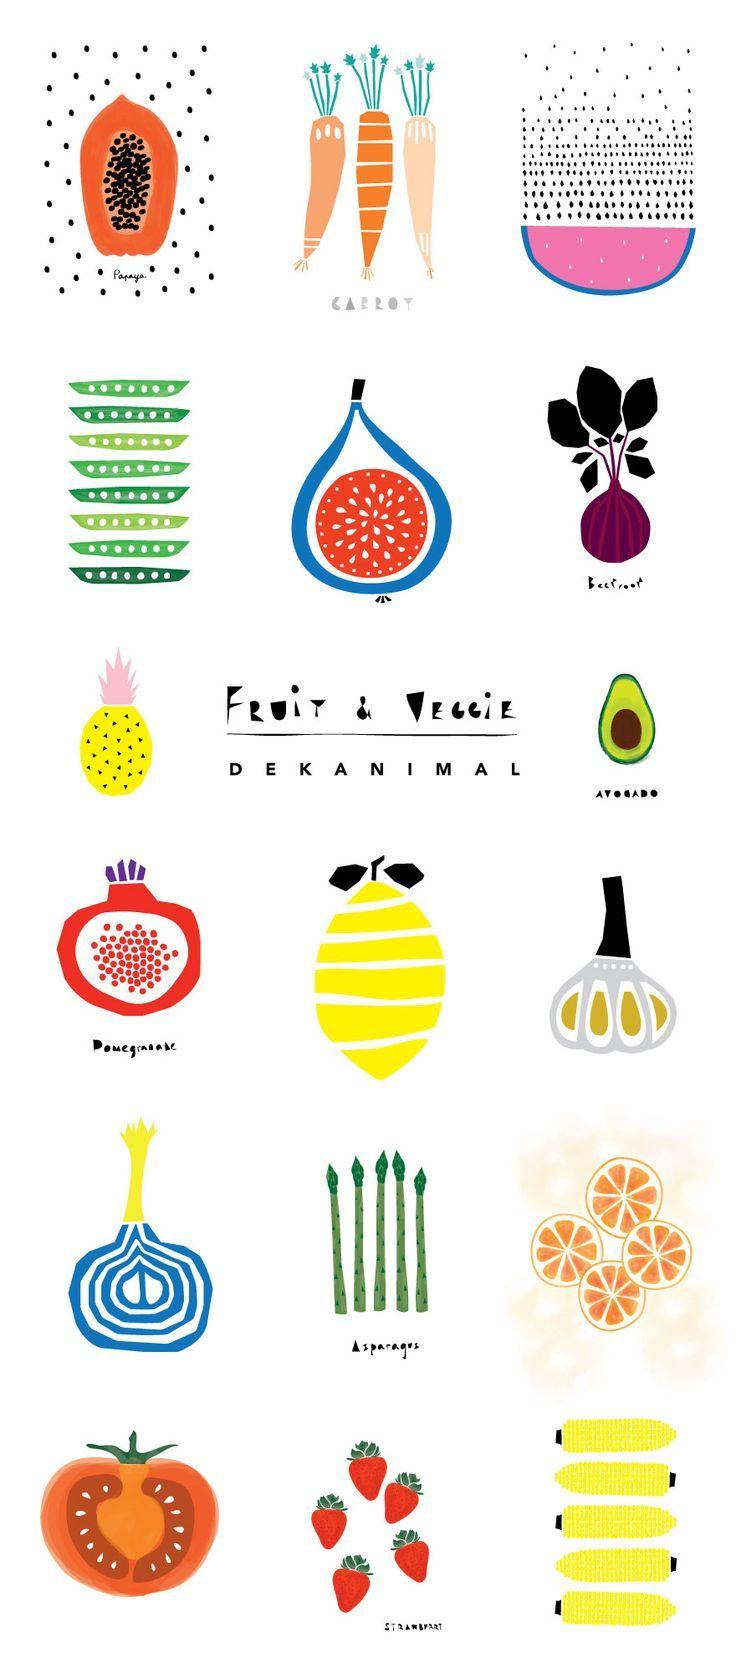 best illustration editorial images on pinterest saul